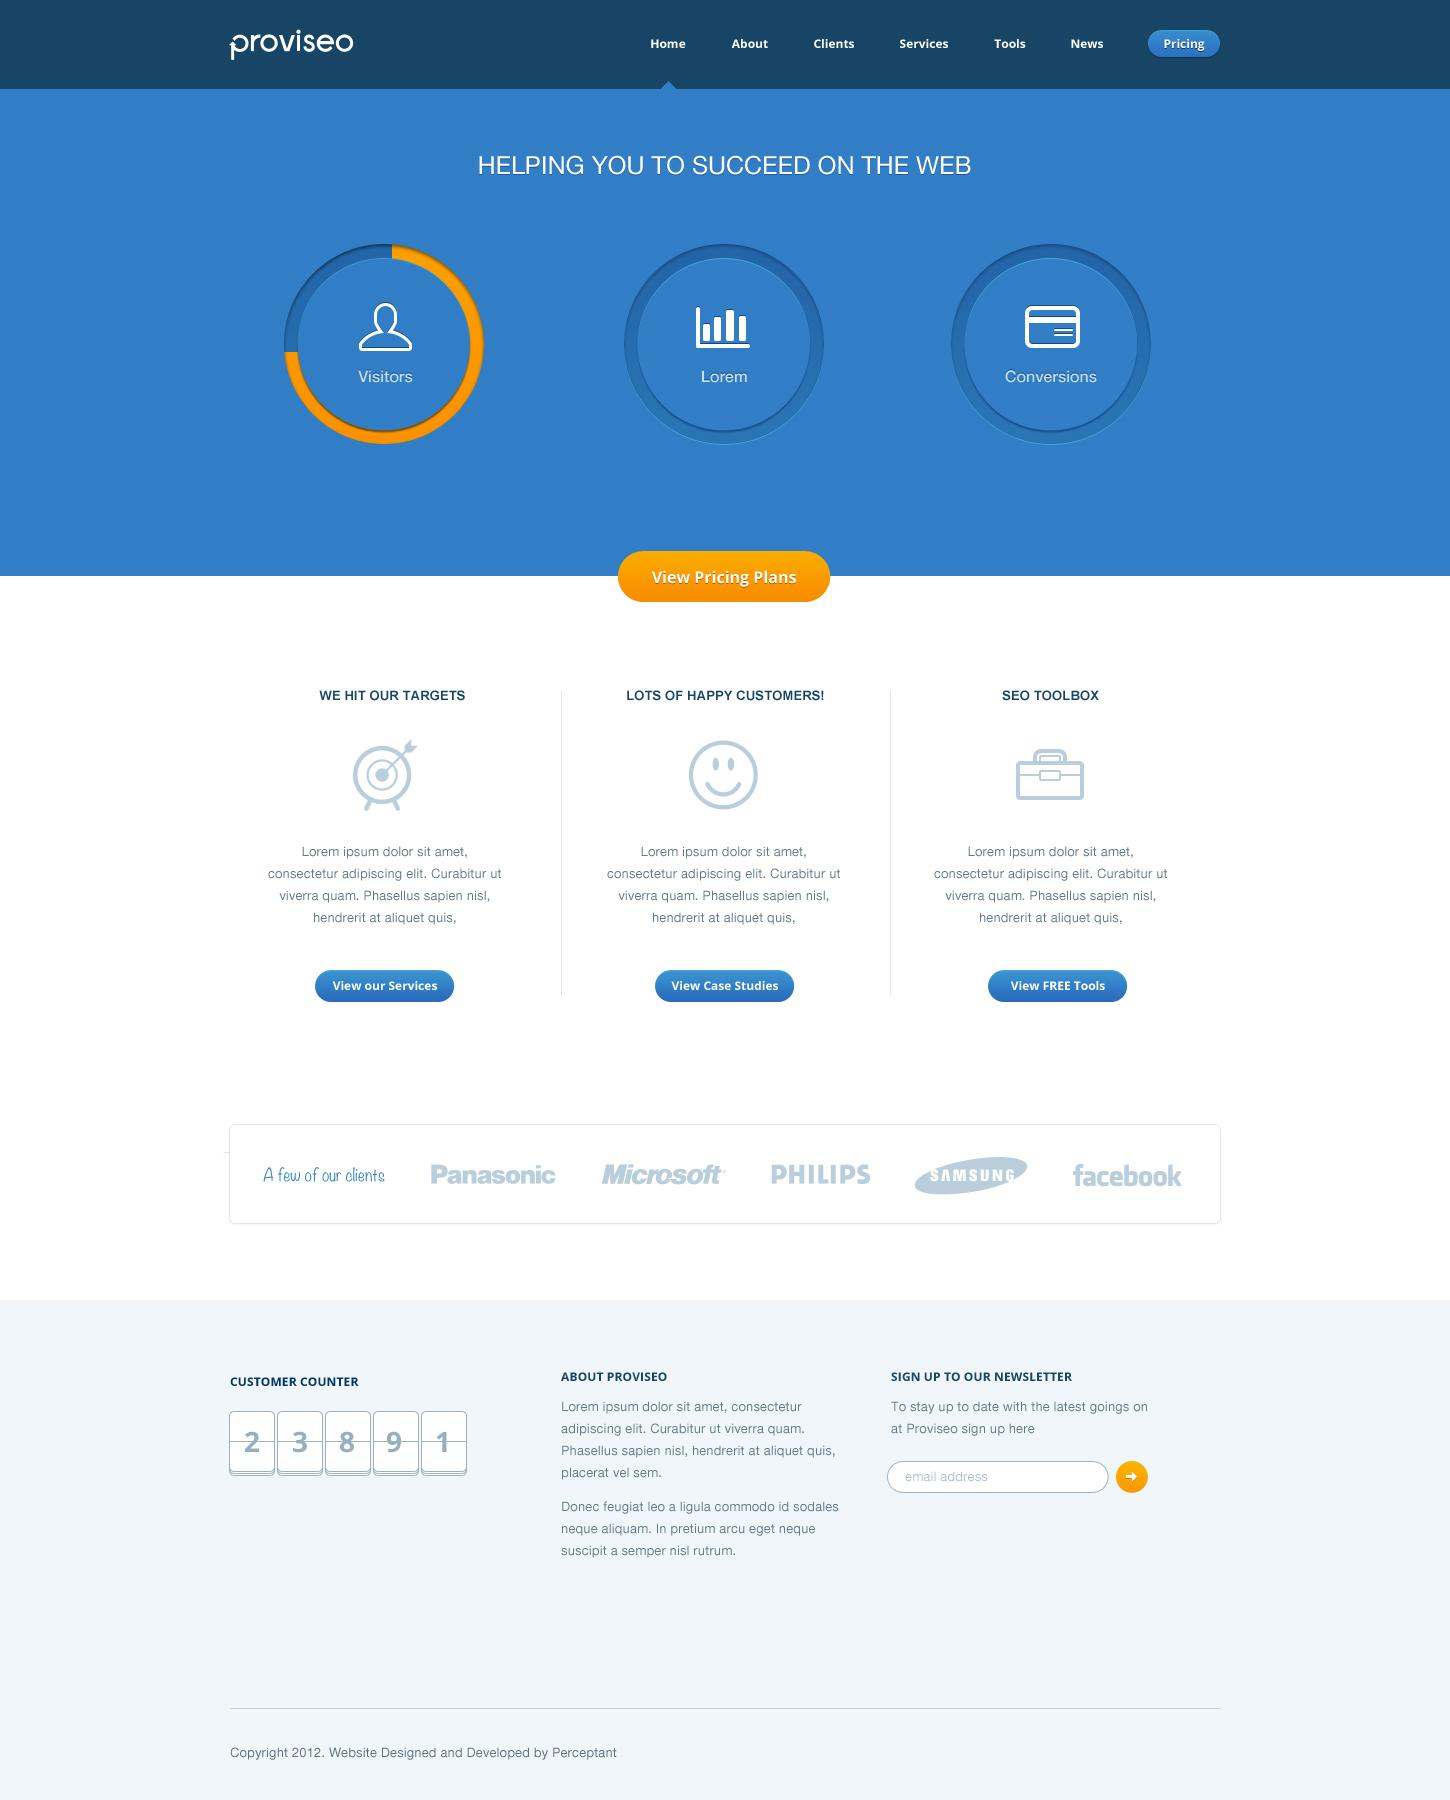 proviseo-homepage-concept.jpg by Joel Siddall